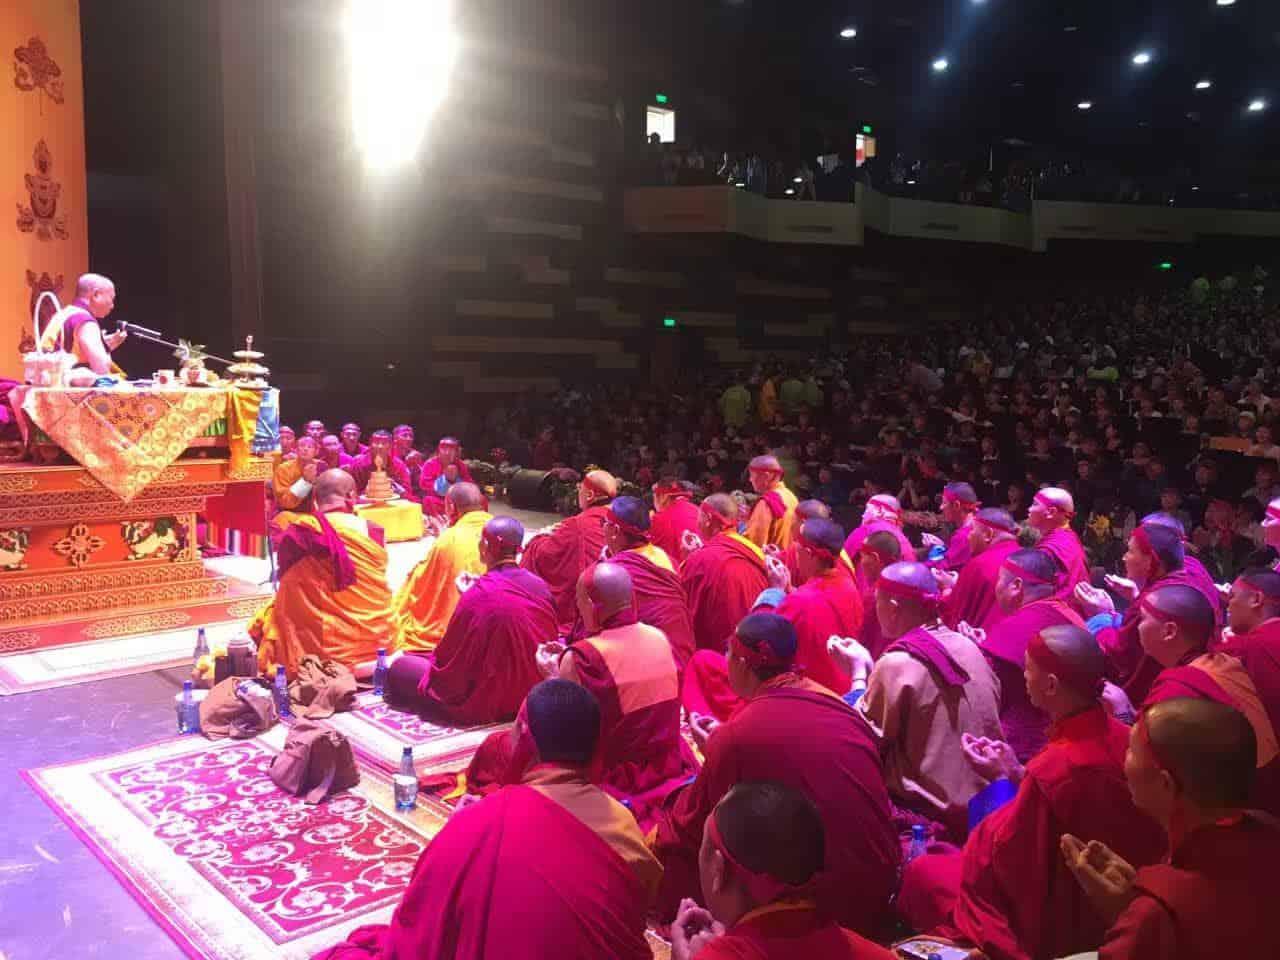 gosok-rinpoche-mongolia-2016-35543507f4c7662aa2f2526de44276a